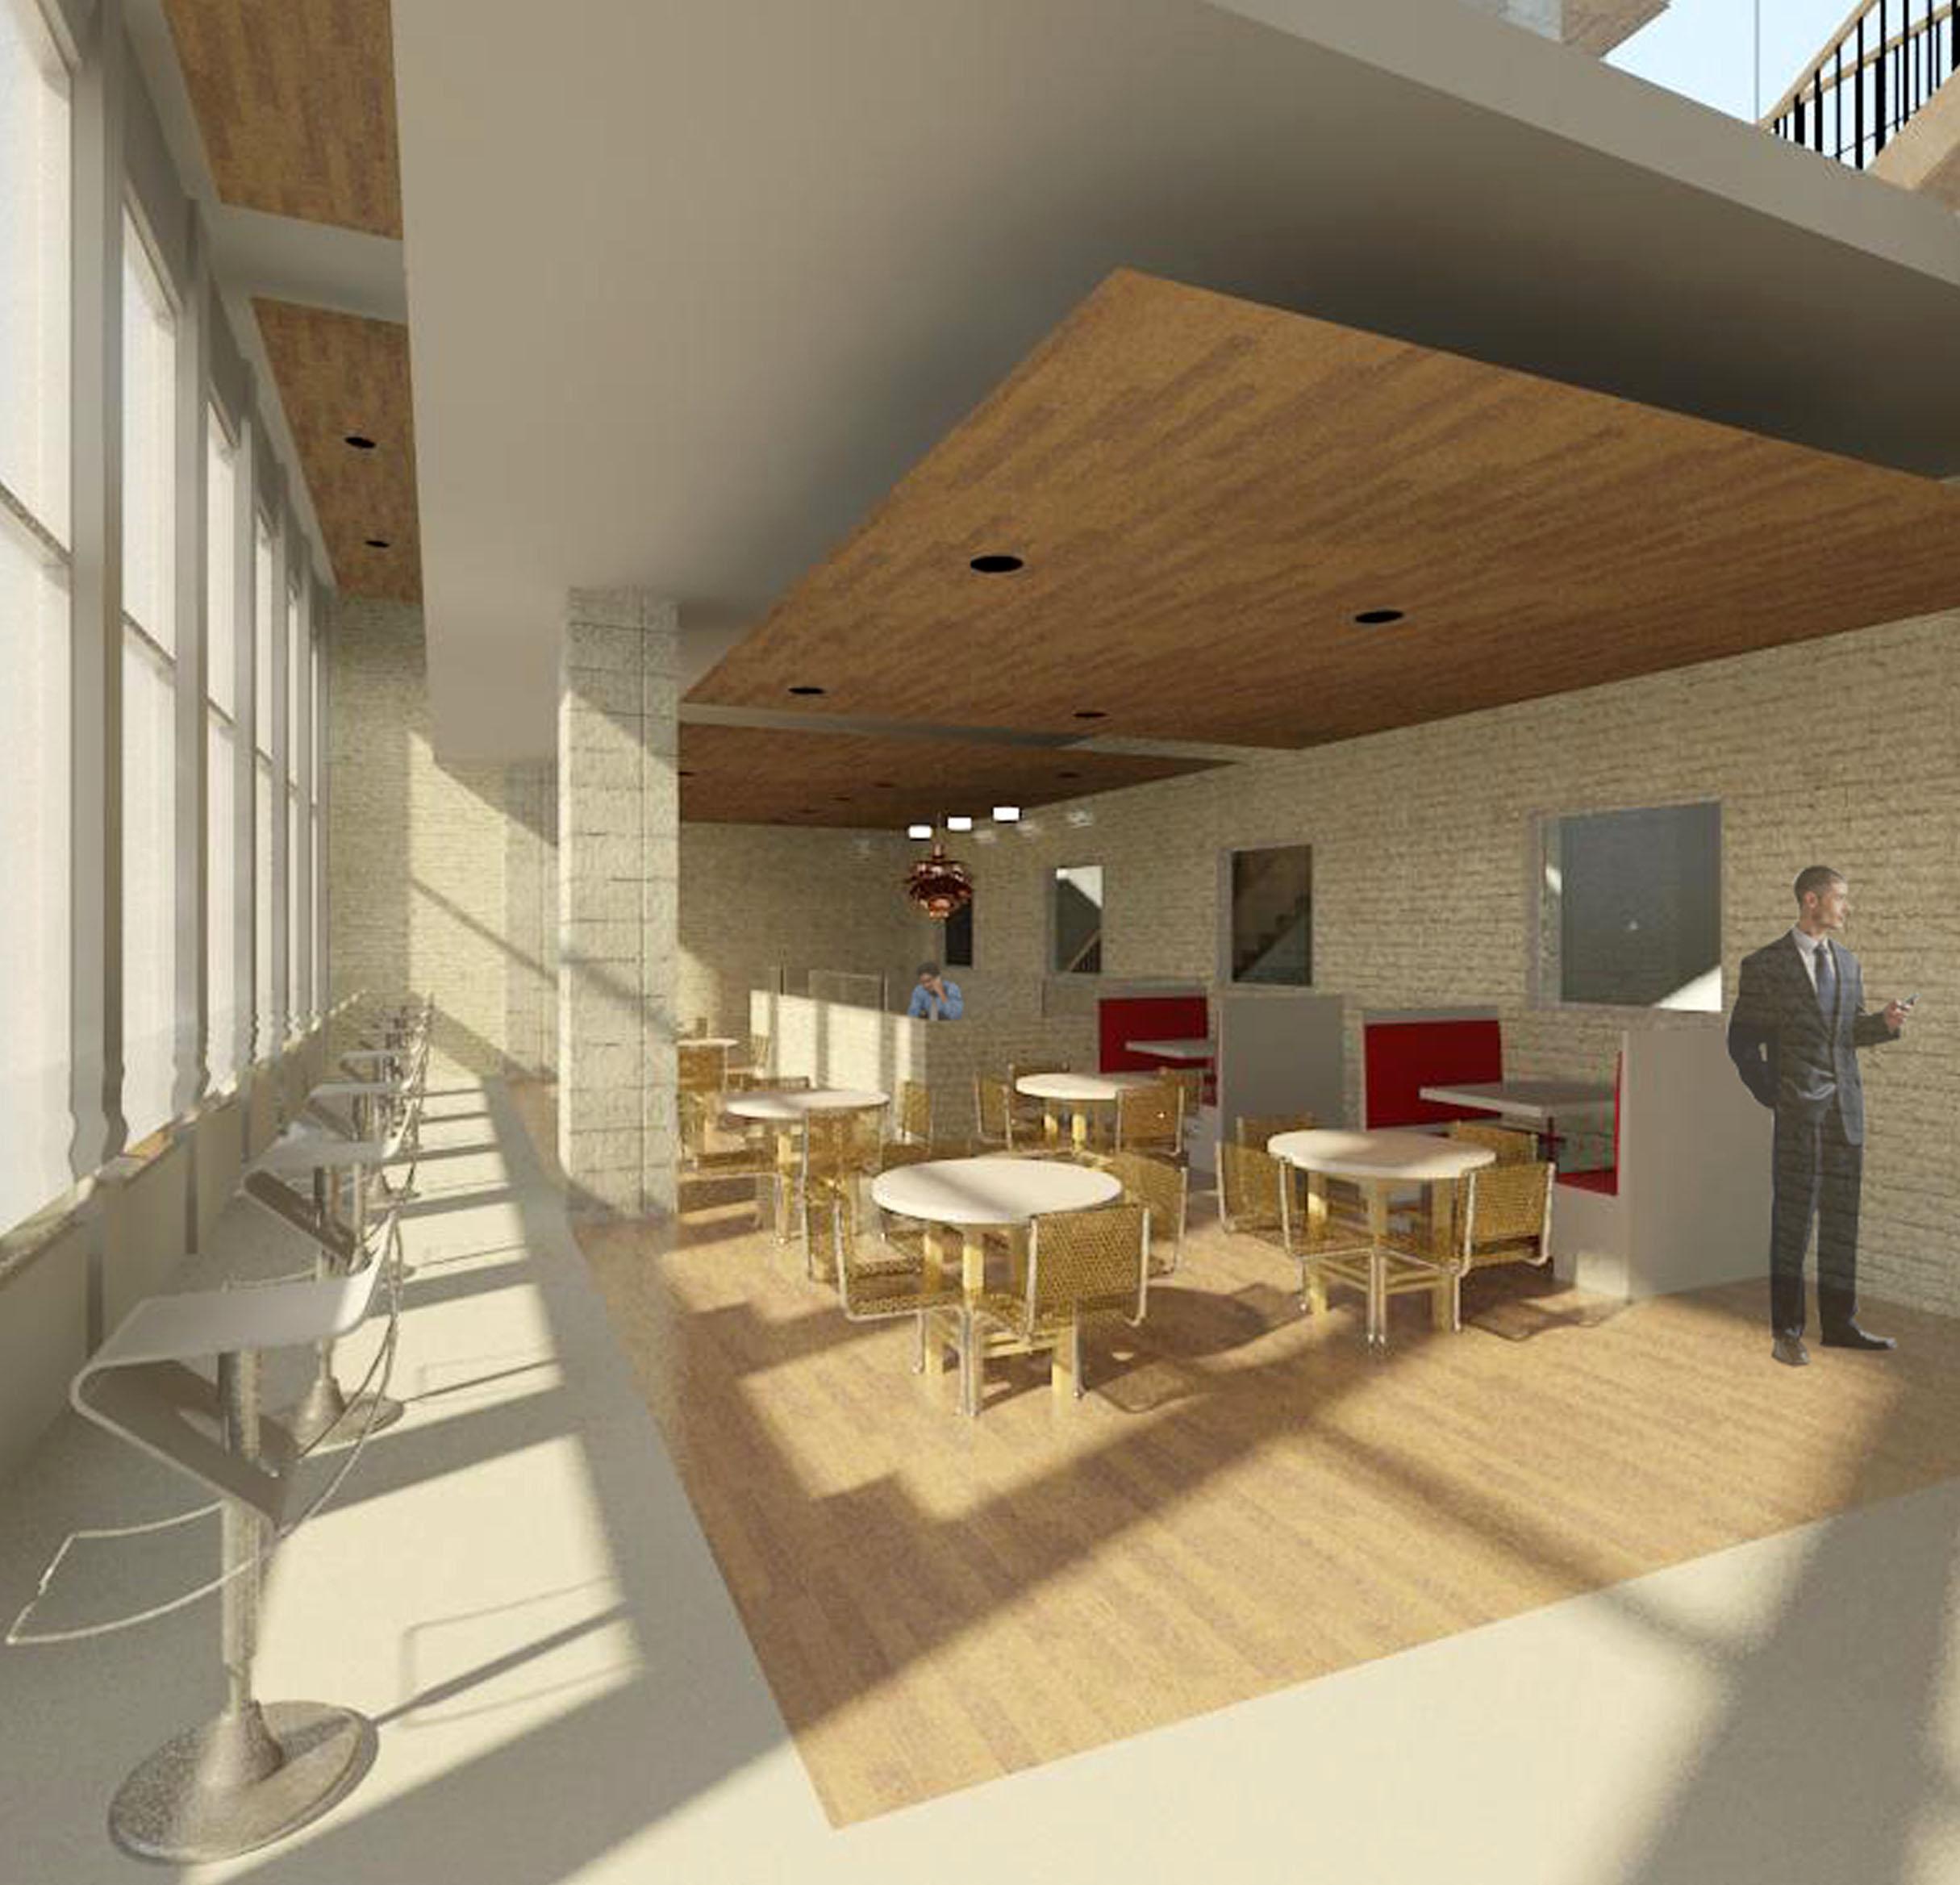 Architectural Rendering Design Consulting Architecture Digital Library Interior